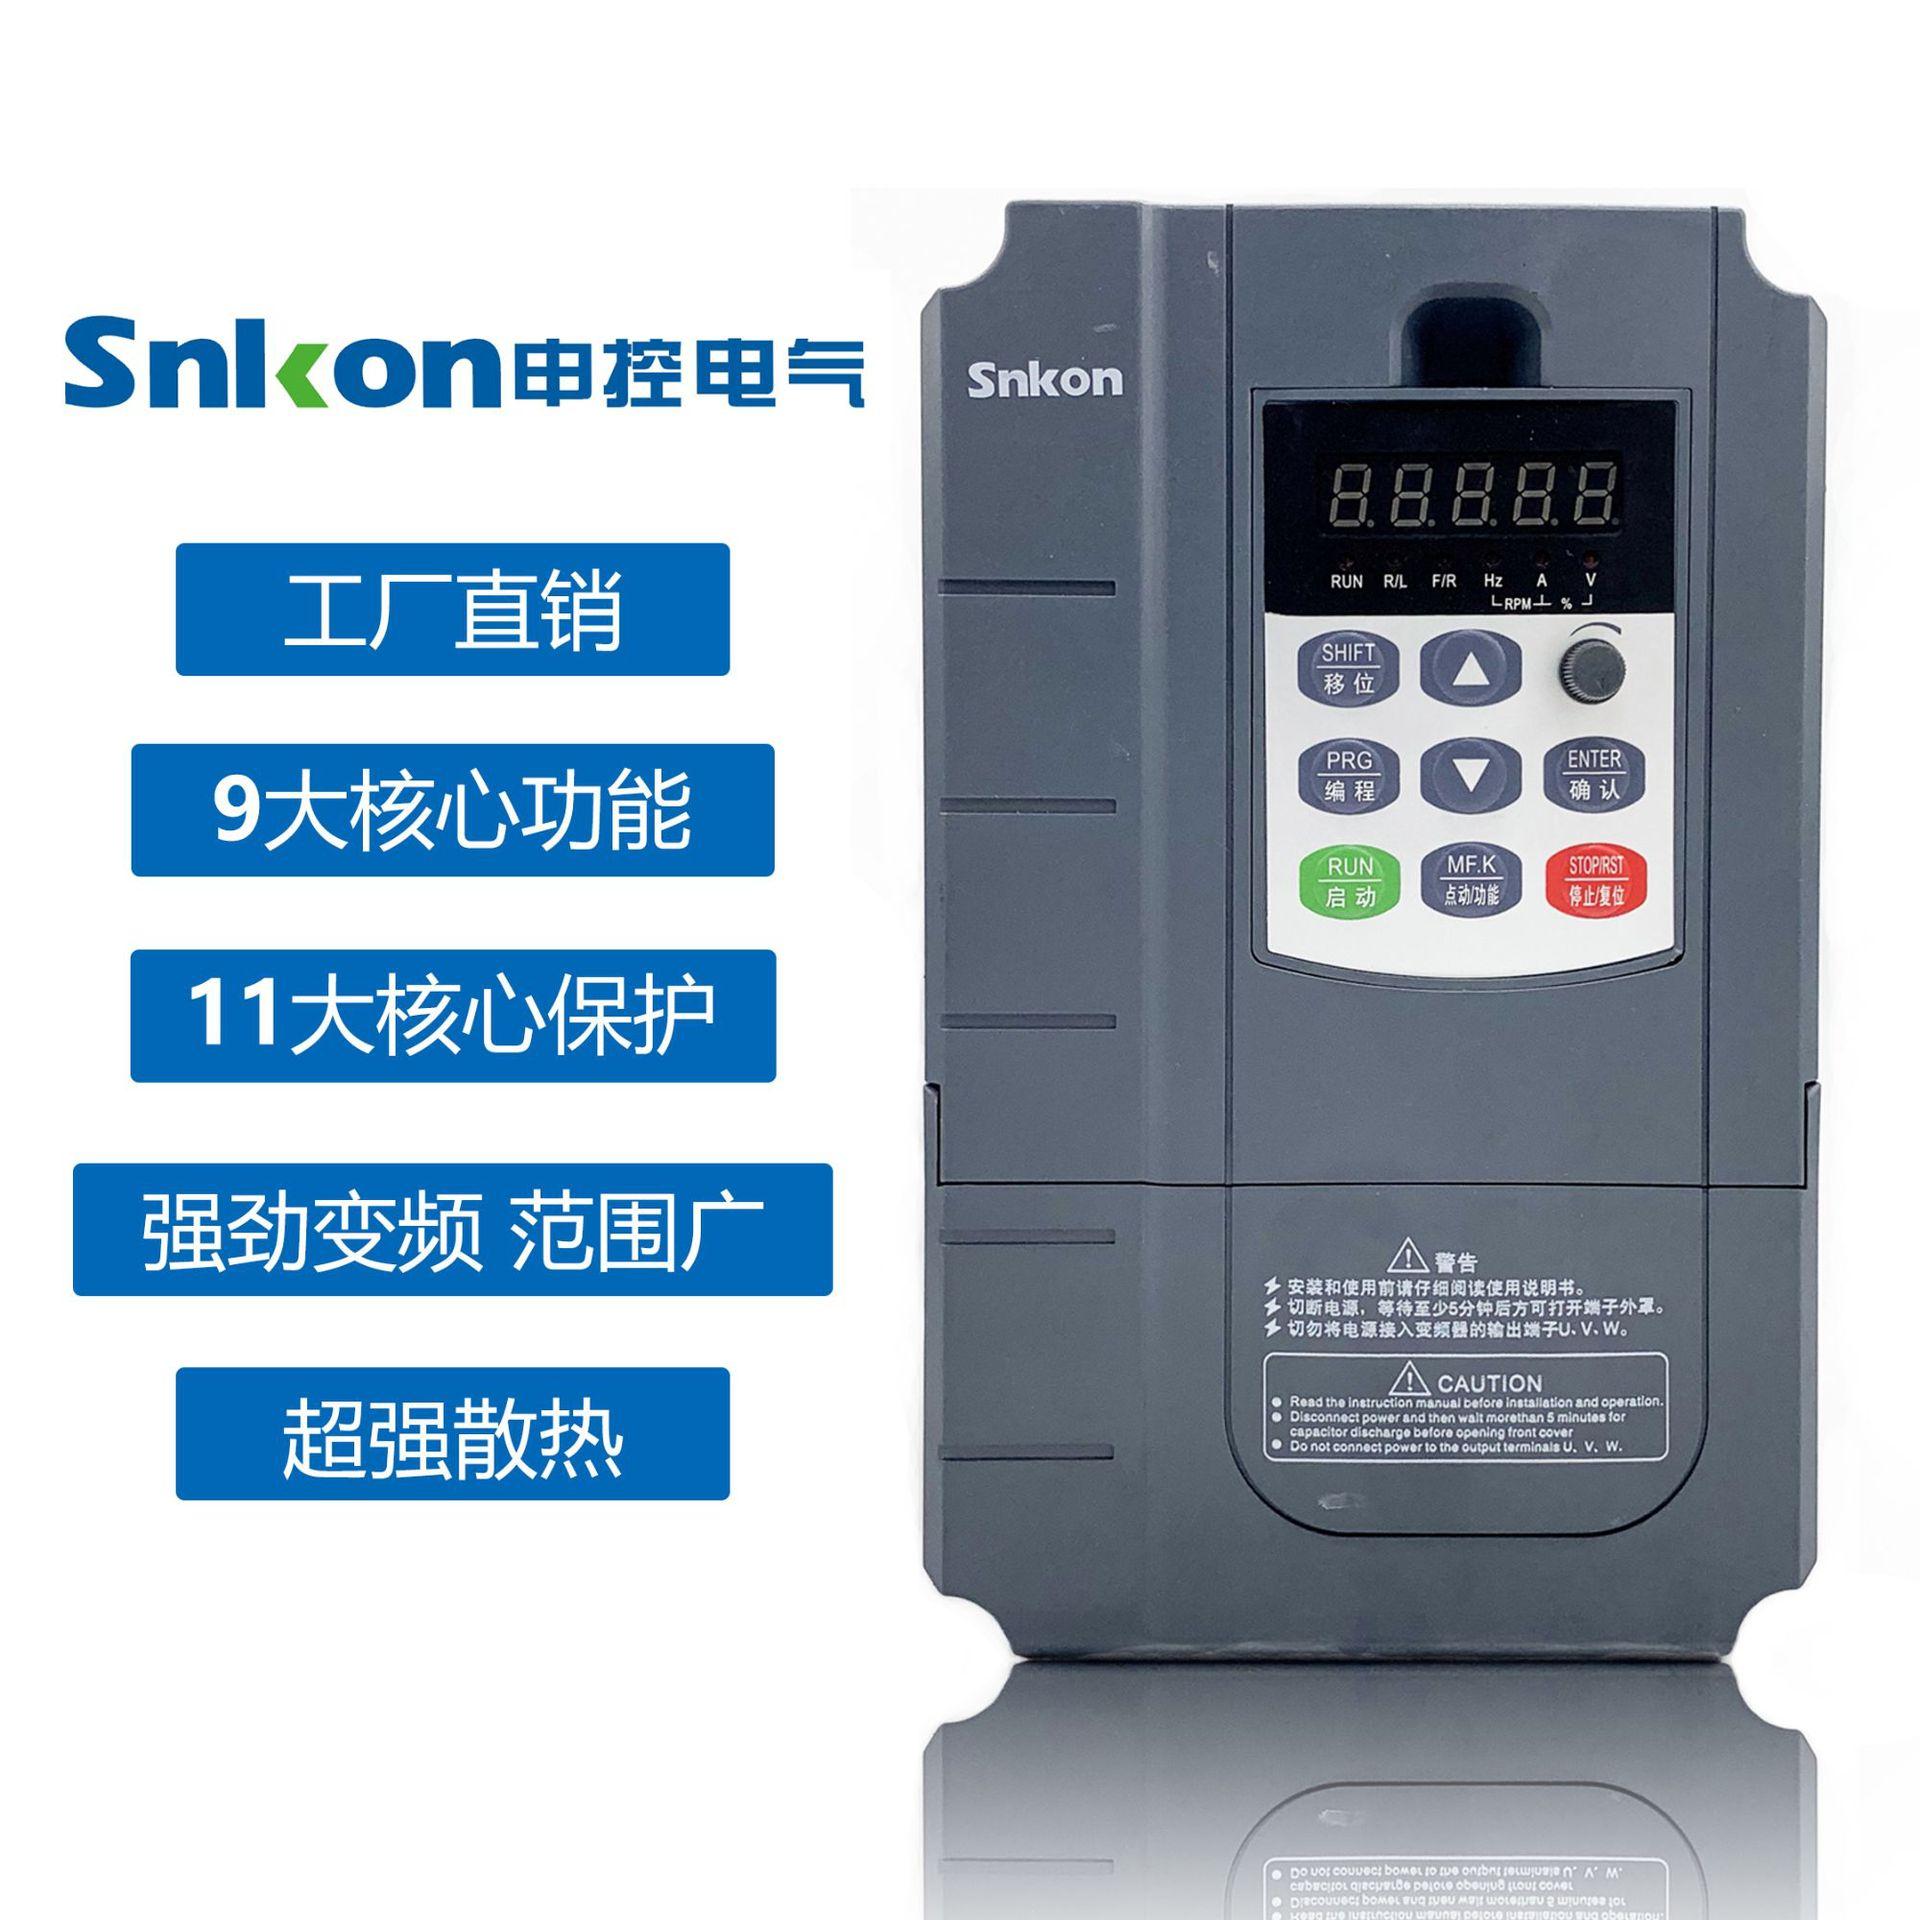 Thiết bị biến tần Shen điều khiển biến tần 0,75 / 1,5 / 2.2KW